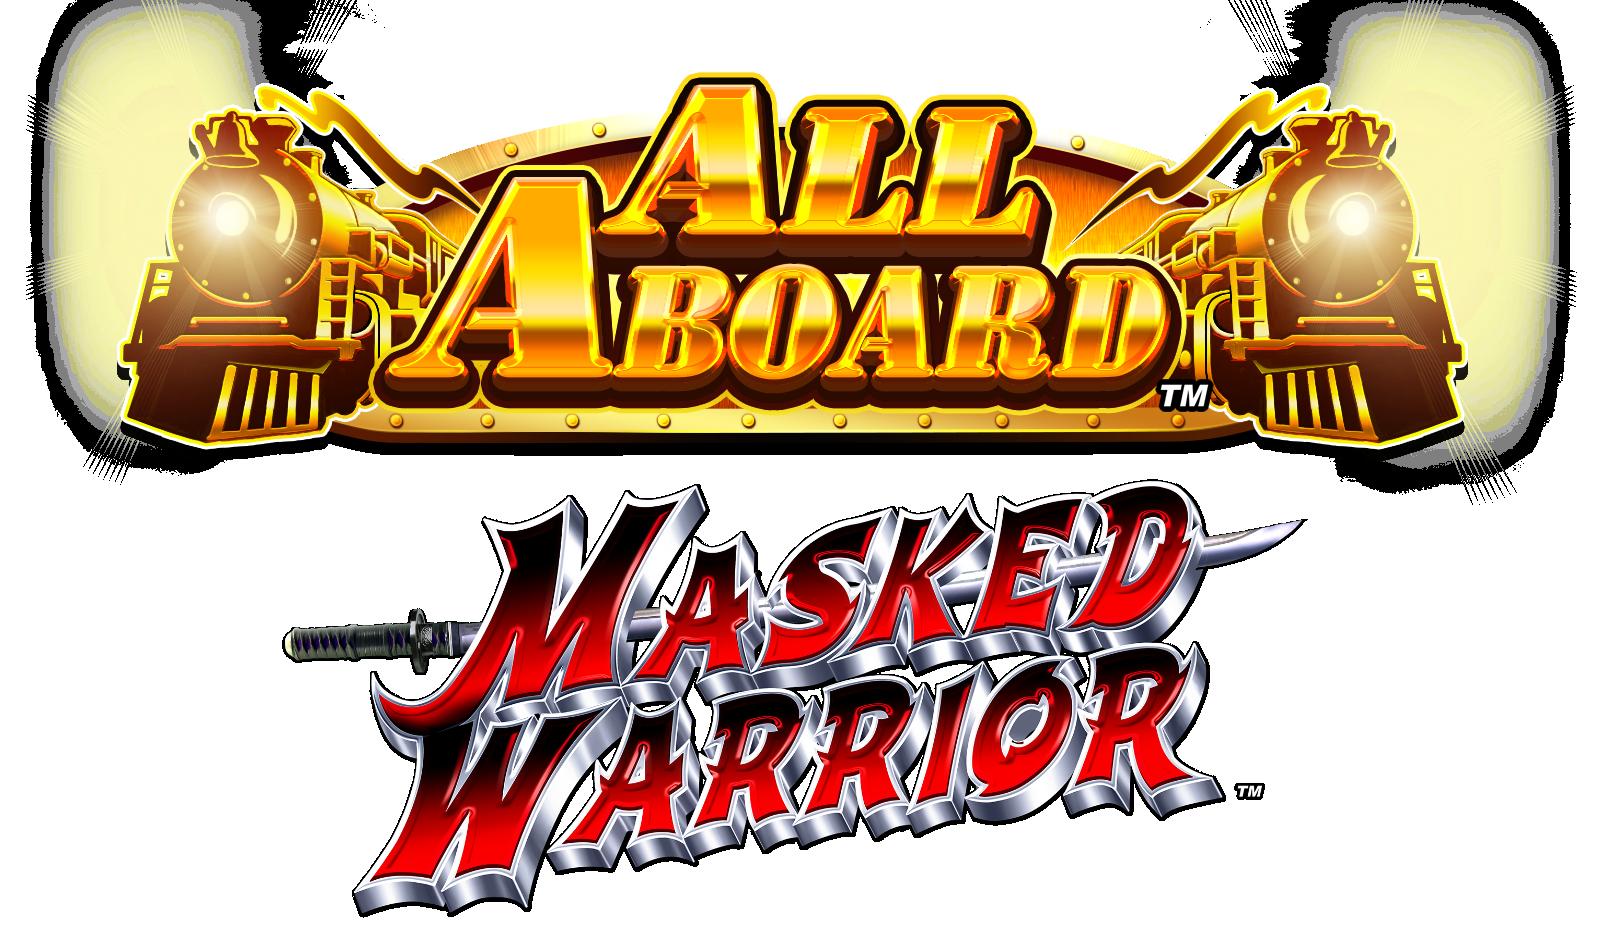 All Aboard Masked Warrior Logo